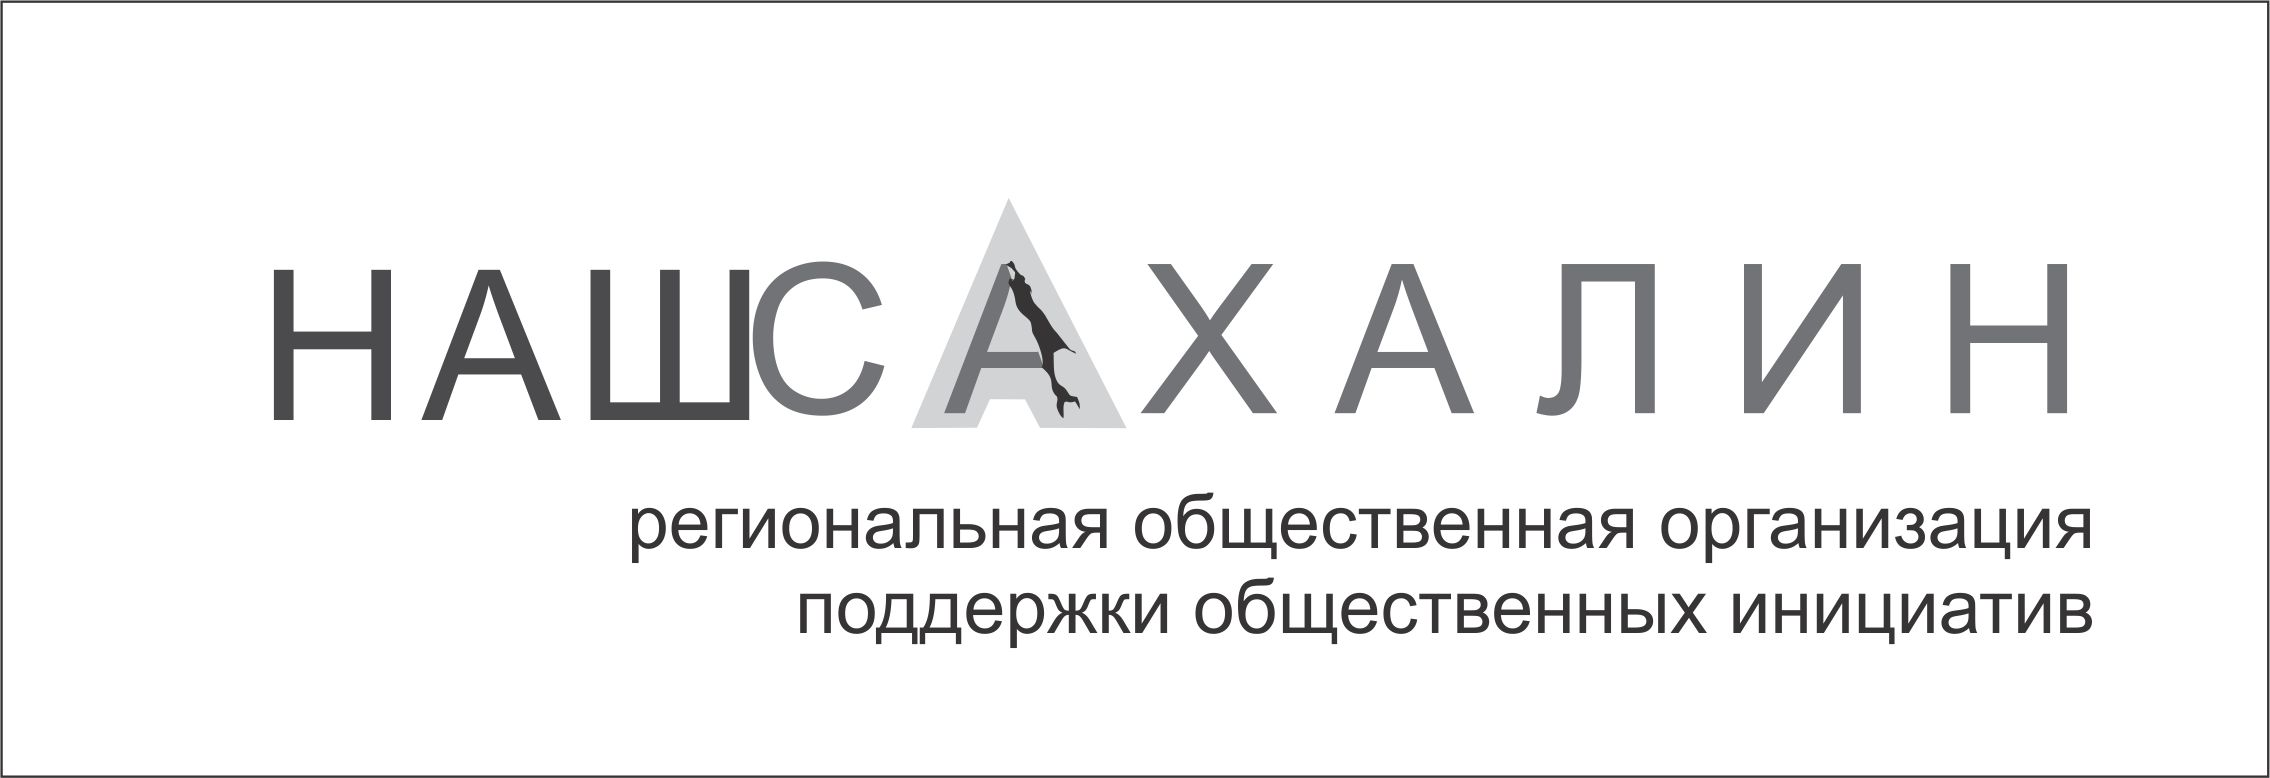 "Логотип для некоммерческой организации ""Наш Сахалин"" фото f_1405a828f4dd8c52.jpg"